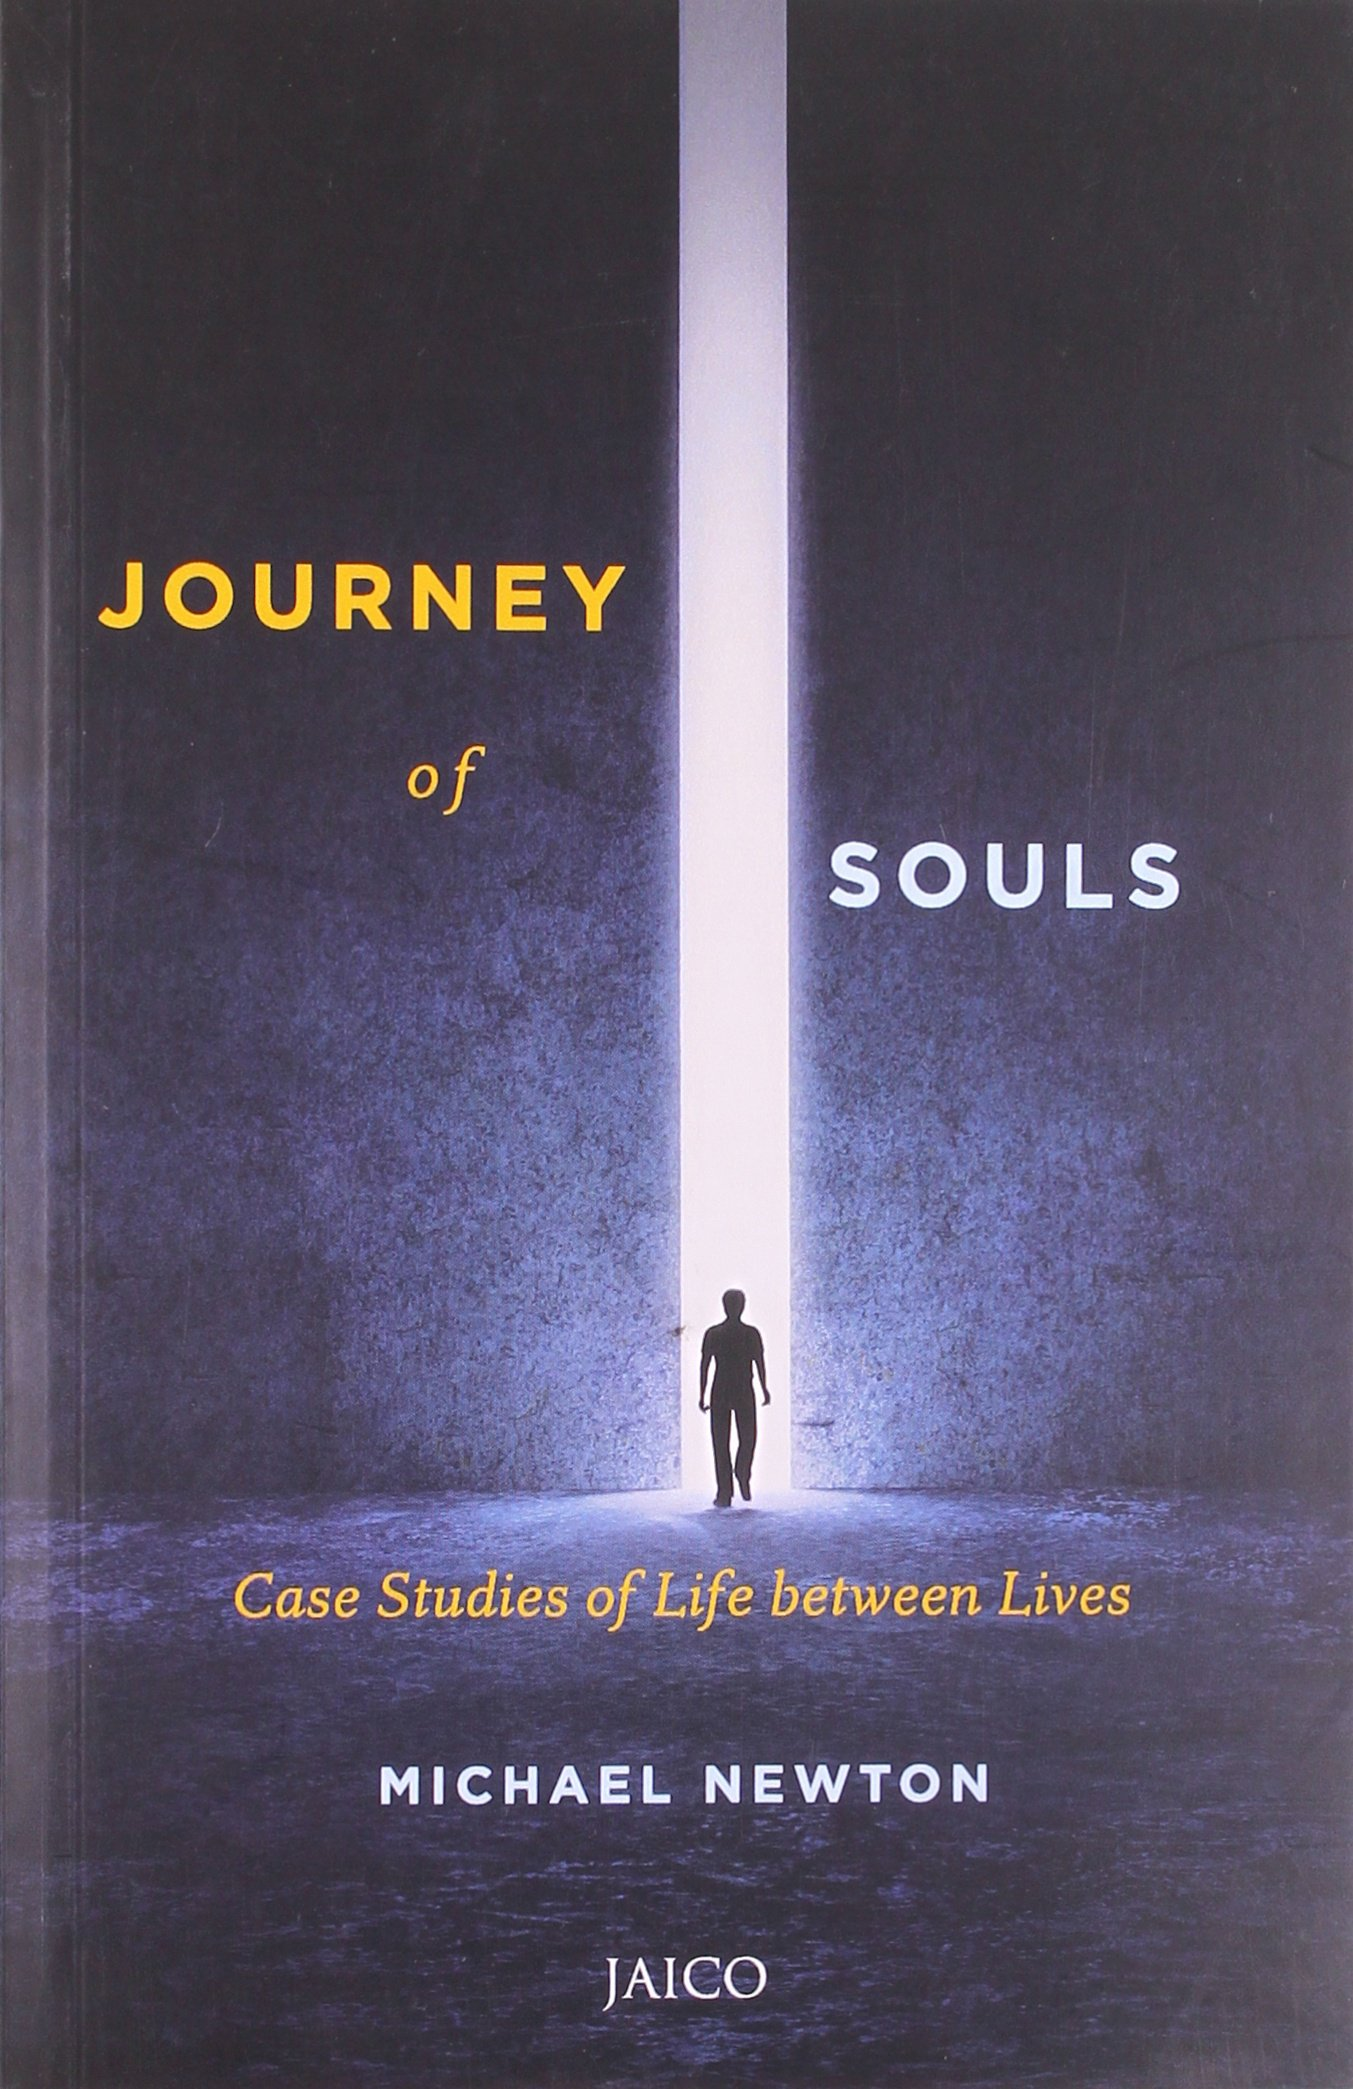 JOURNEY OF SOULS (CASE STUDIES OF LIFE BETWEEN LIVES)